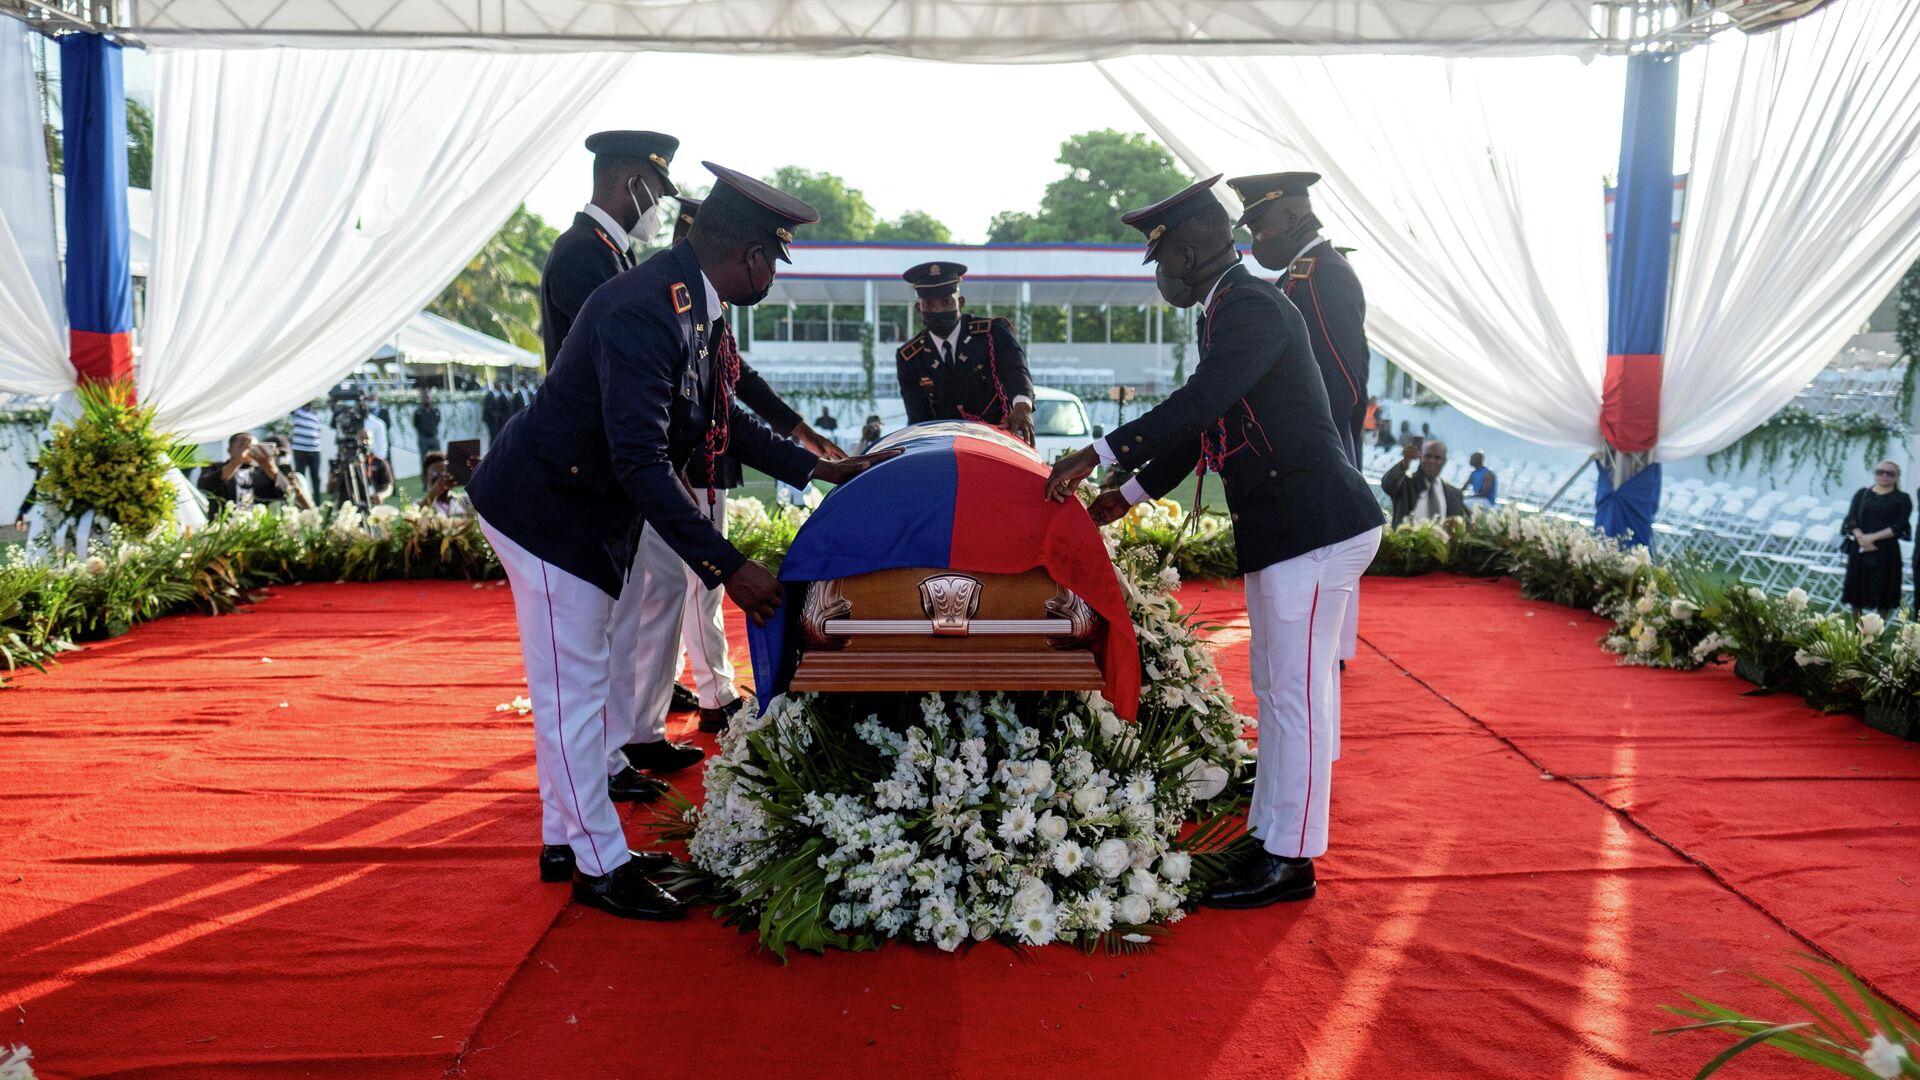 El funeral del asesinado presidente haitiano Jovenel Moise - Sputnik Mundo, 1920, 10.08.2021